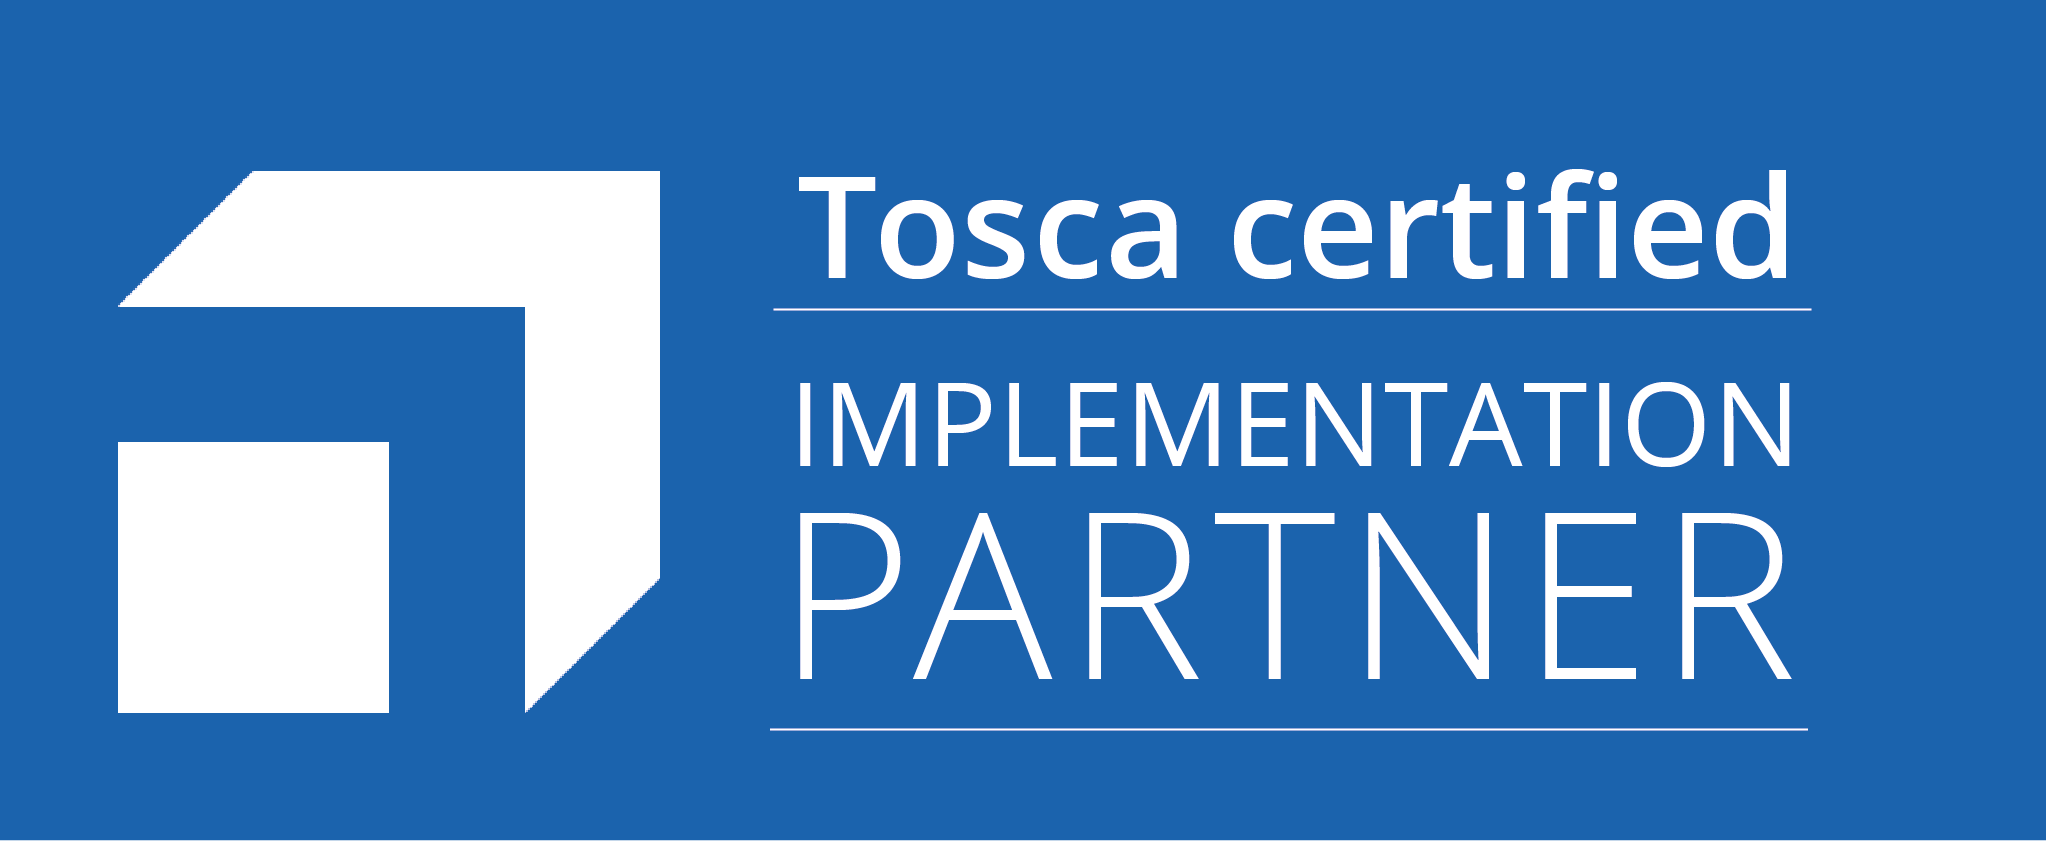 tosca test suite   qualification